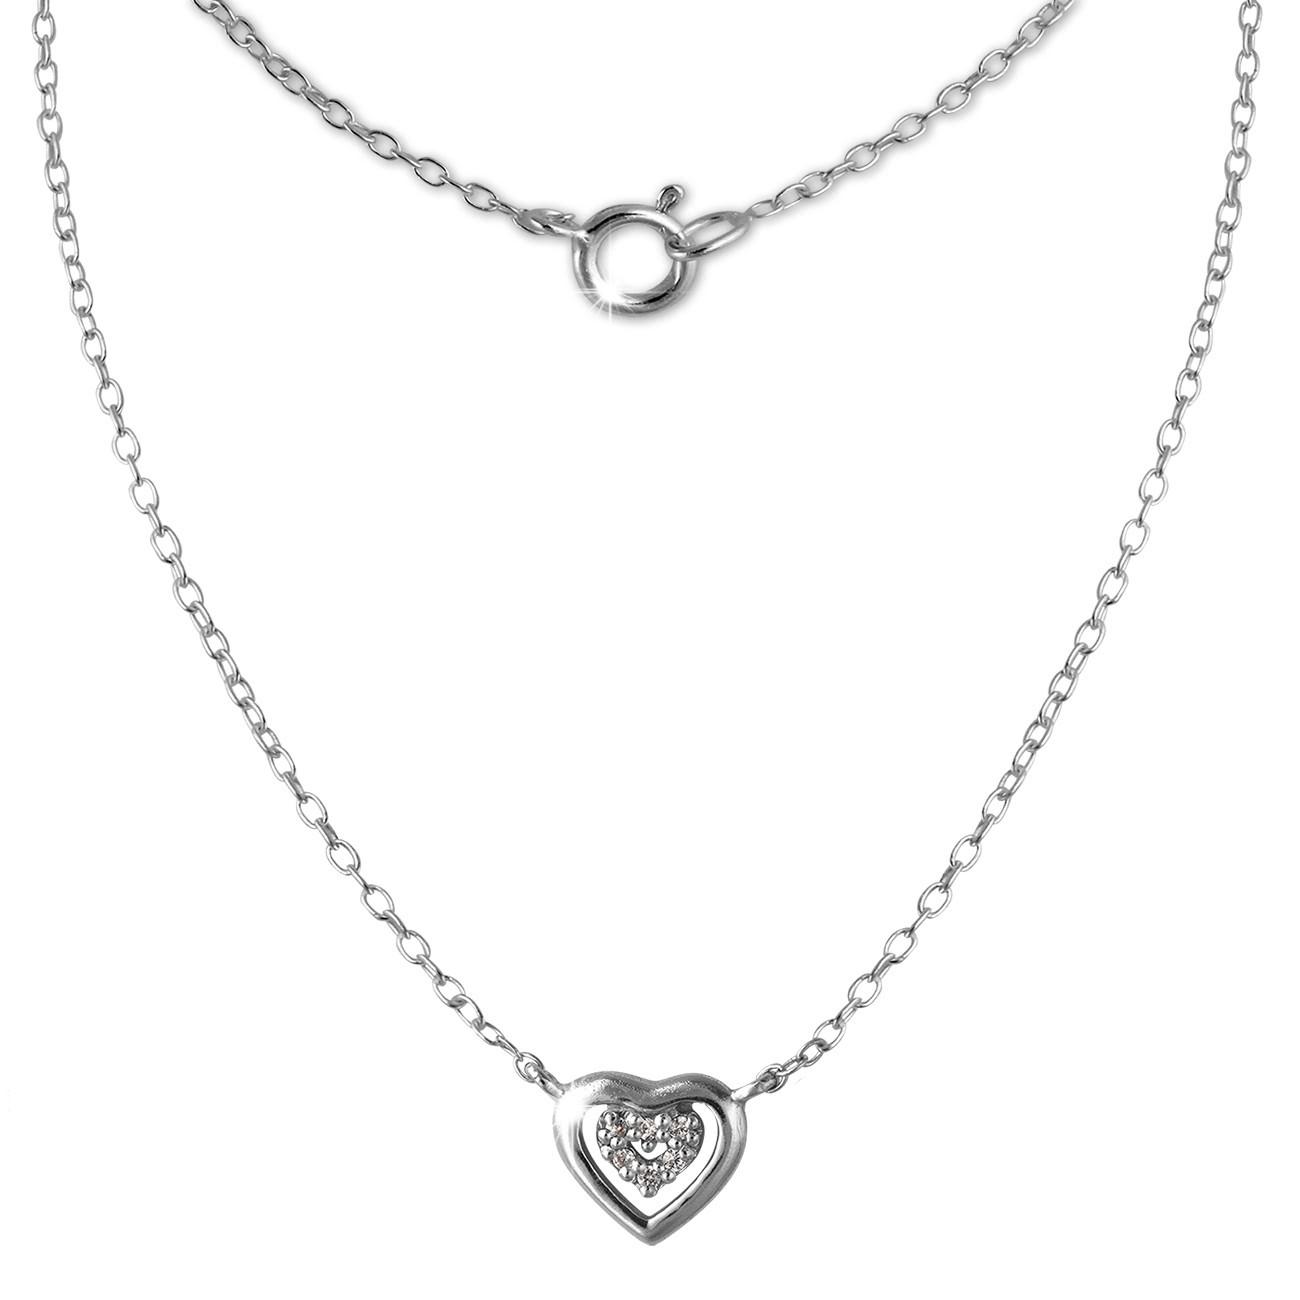 SilberDream Kette Herz 925er Sterling Silber 45cm Halskette SDK8009J